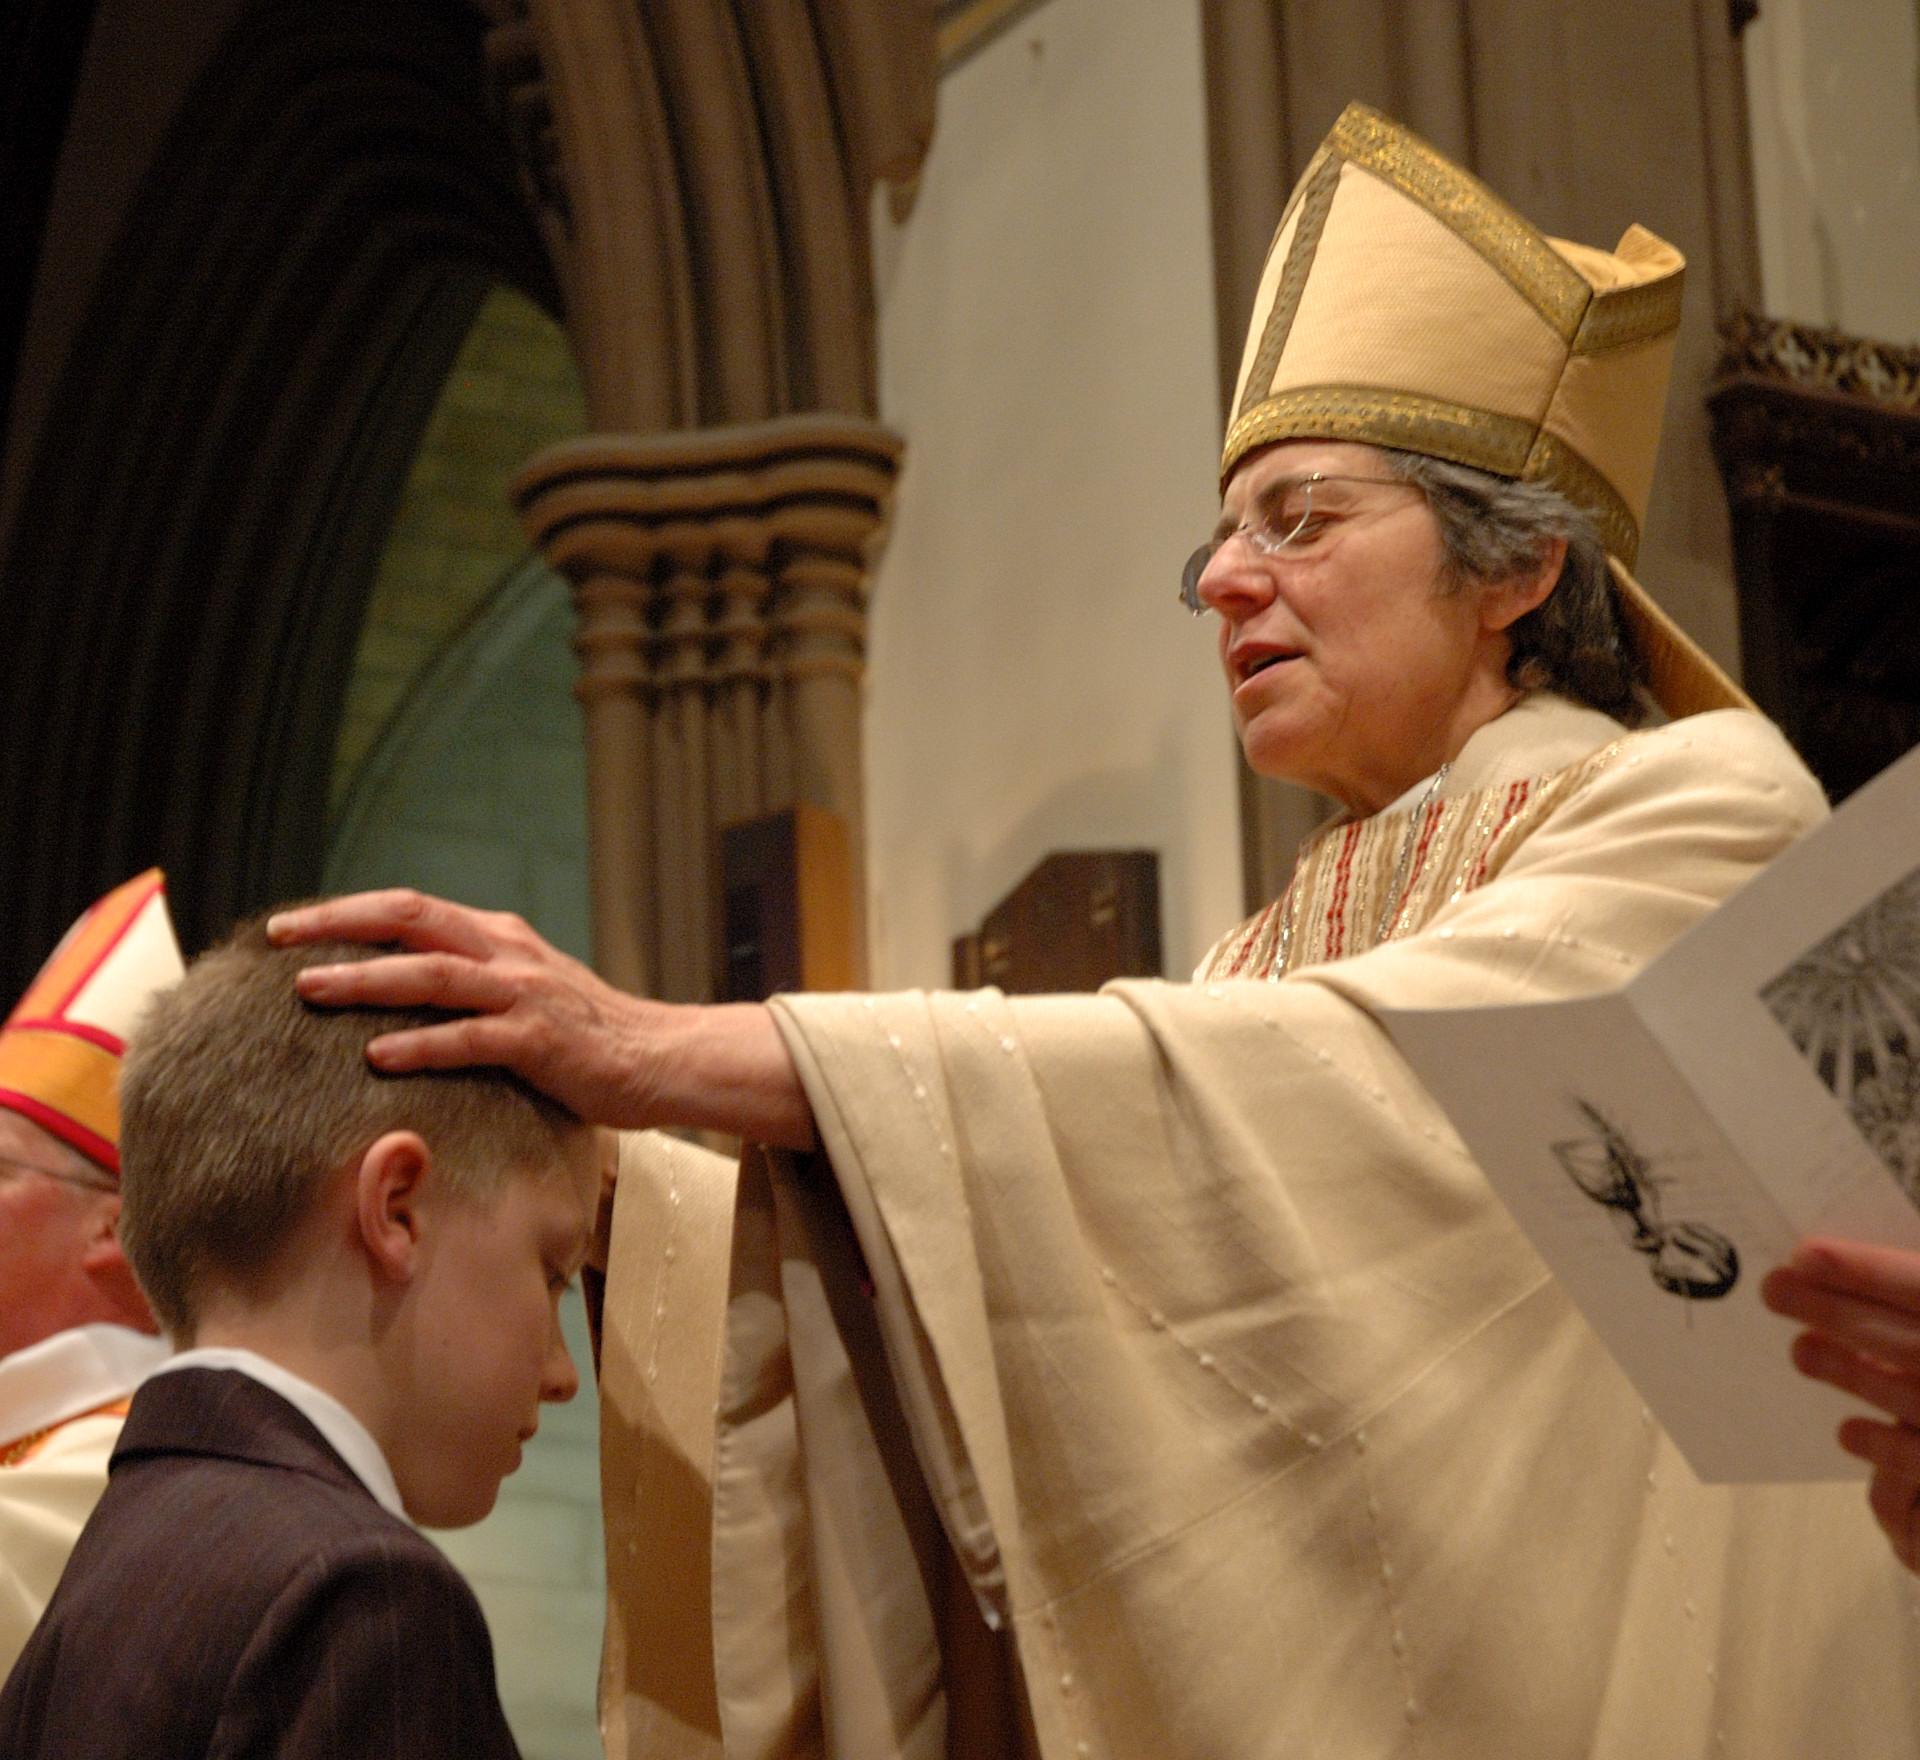 Bishop confirming